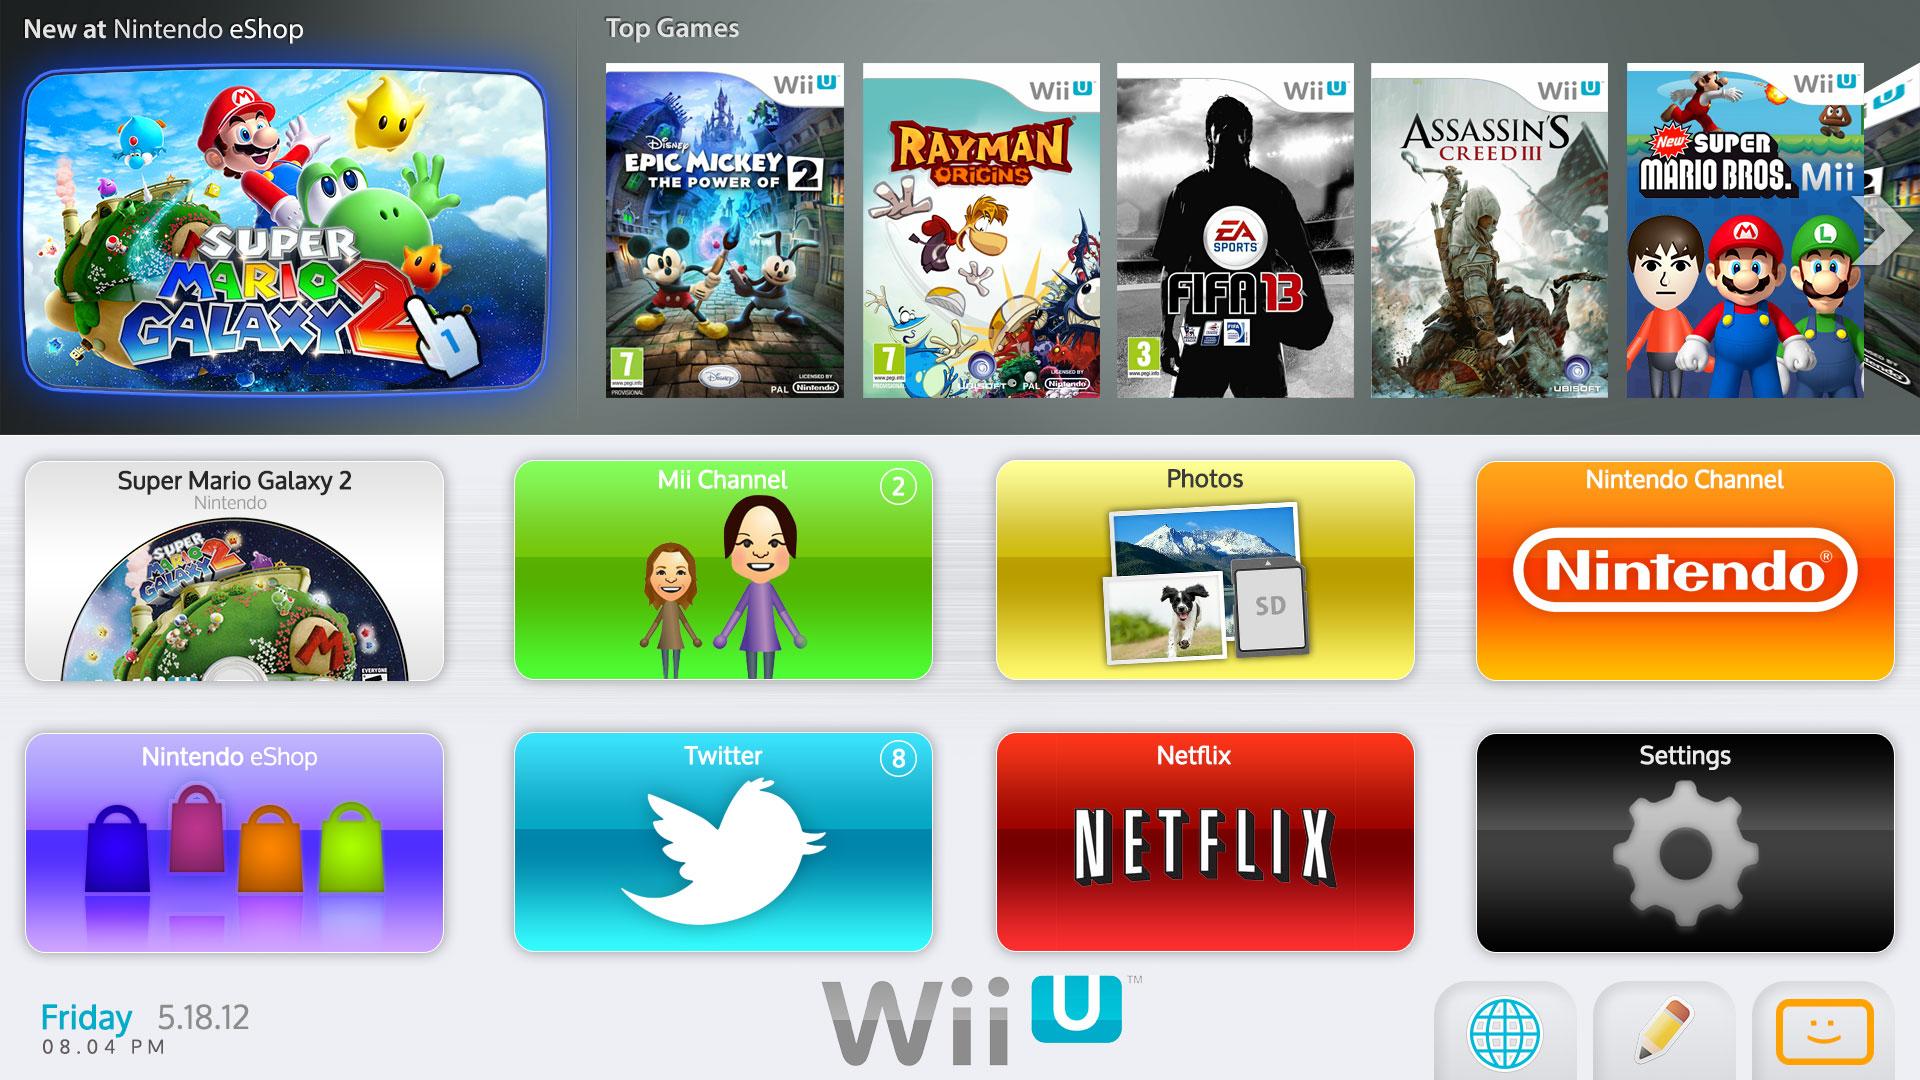 Wii U menu - Page 5 - Wii U Hardware - Wii U Forums